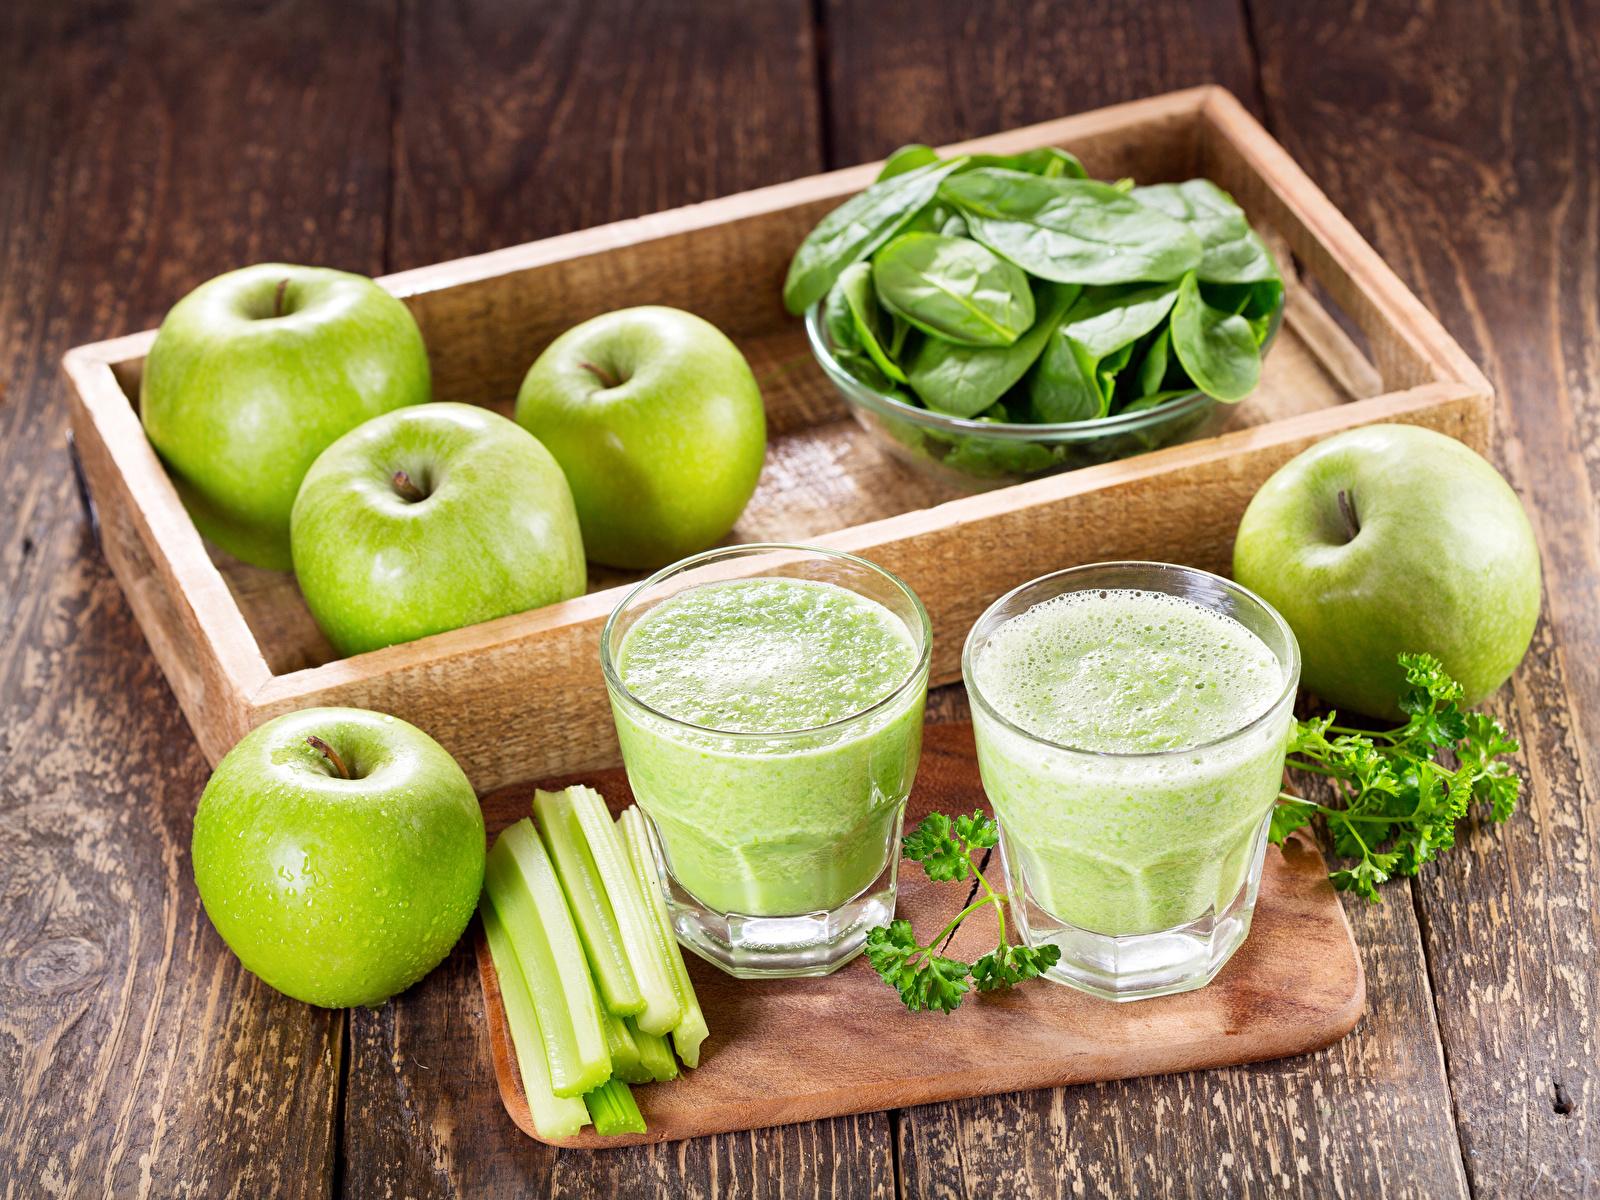 Картинка Смузи Яблоки стакане Еда Овощи Доски 1600x1200 Стакан стакана Пища Продукты питания